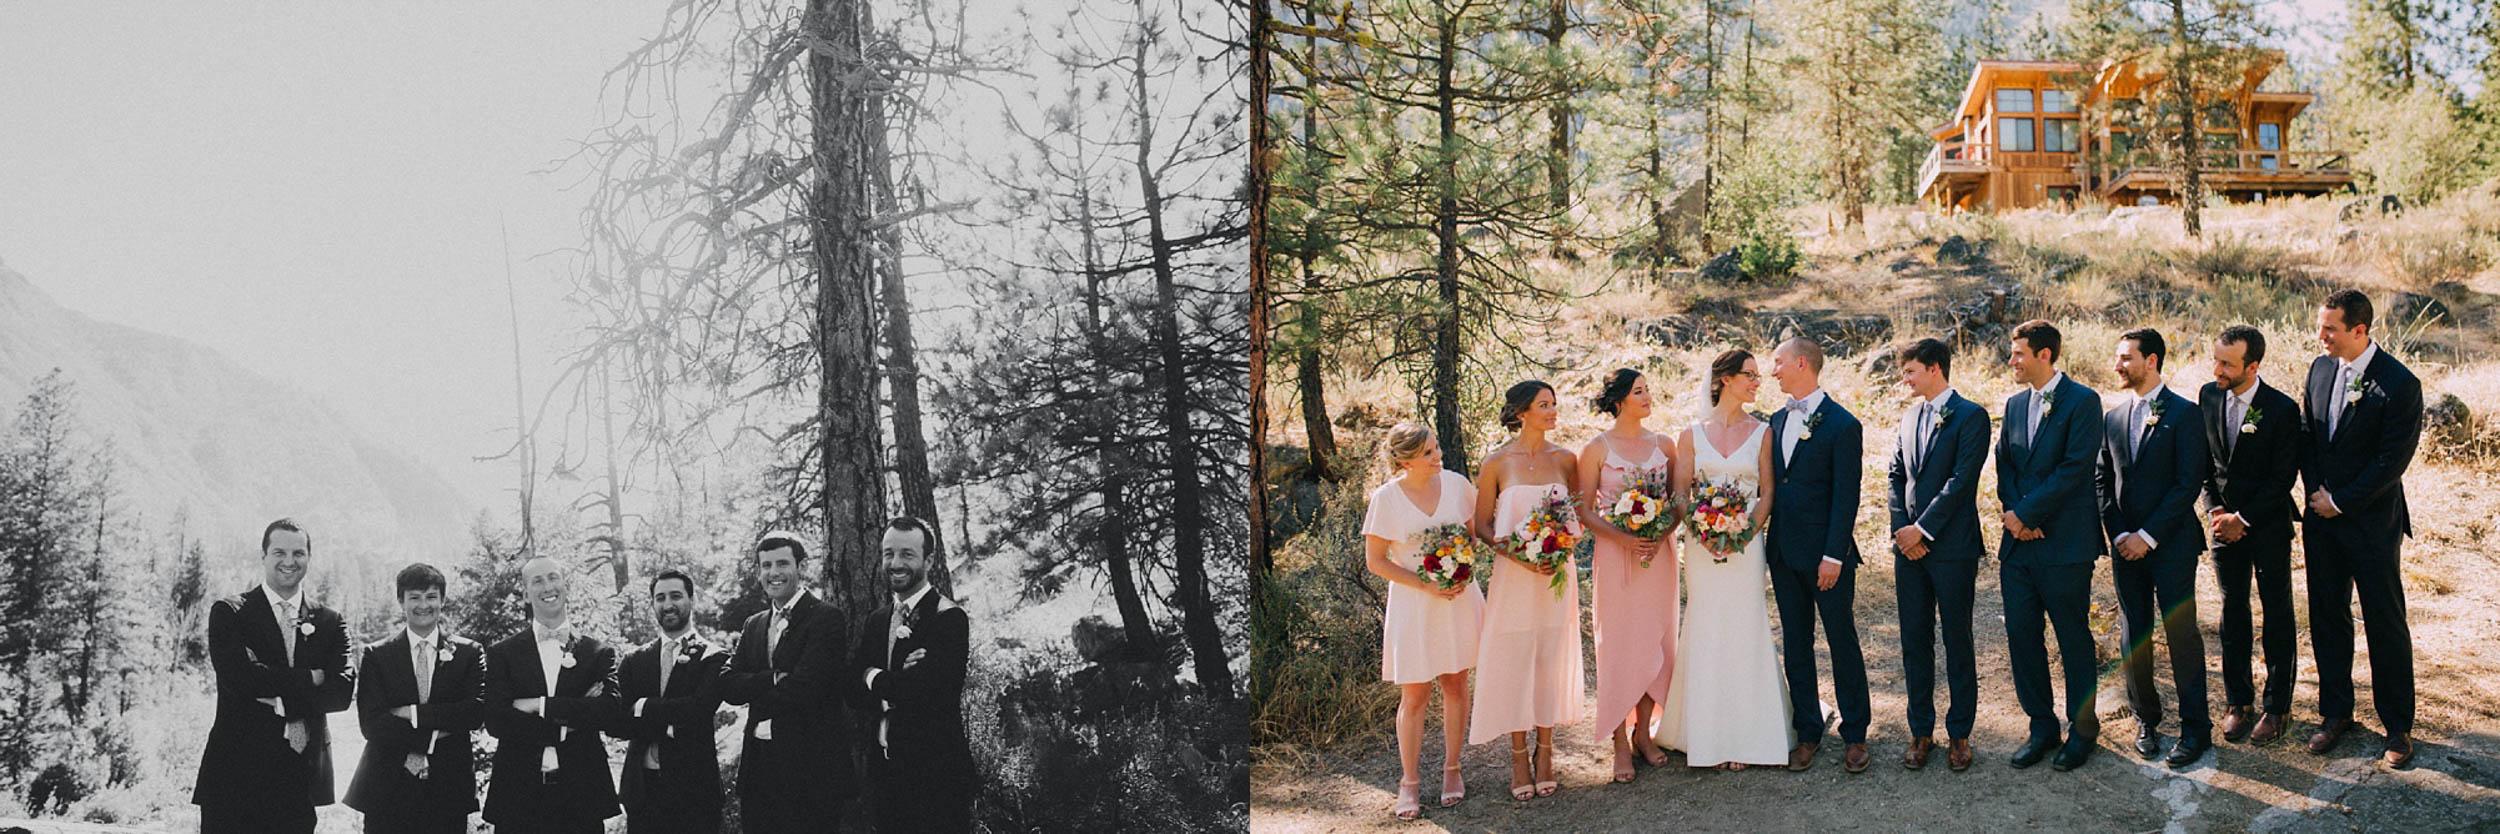 seattle and pacific northwest wedding photographer western washington wedding-13.jpg